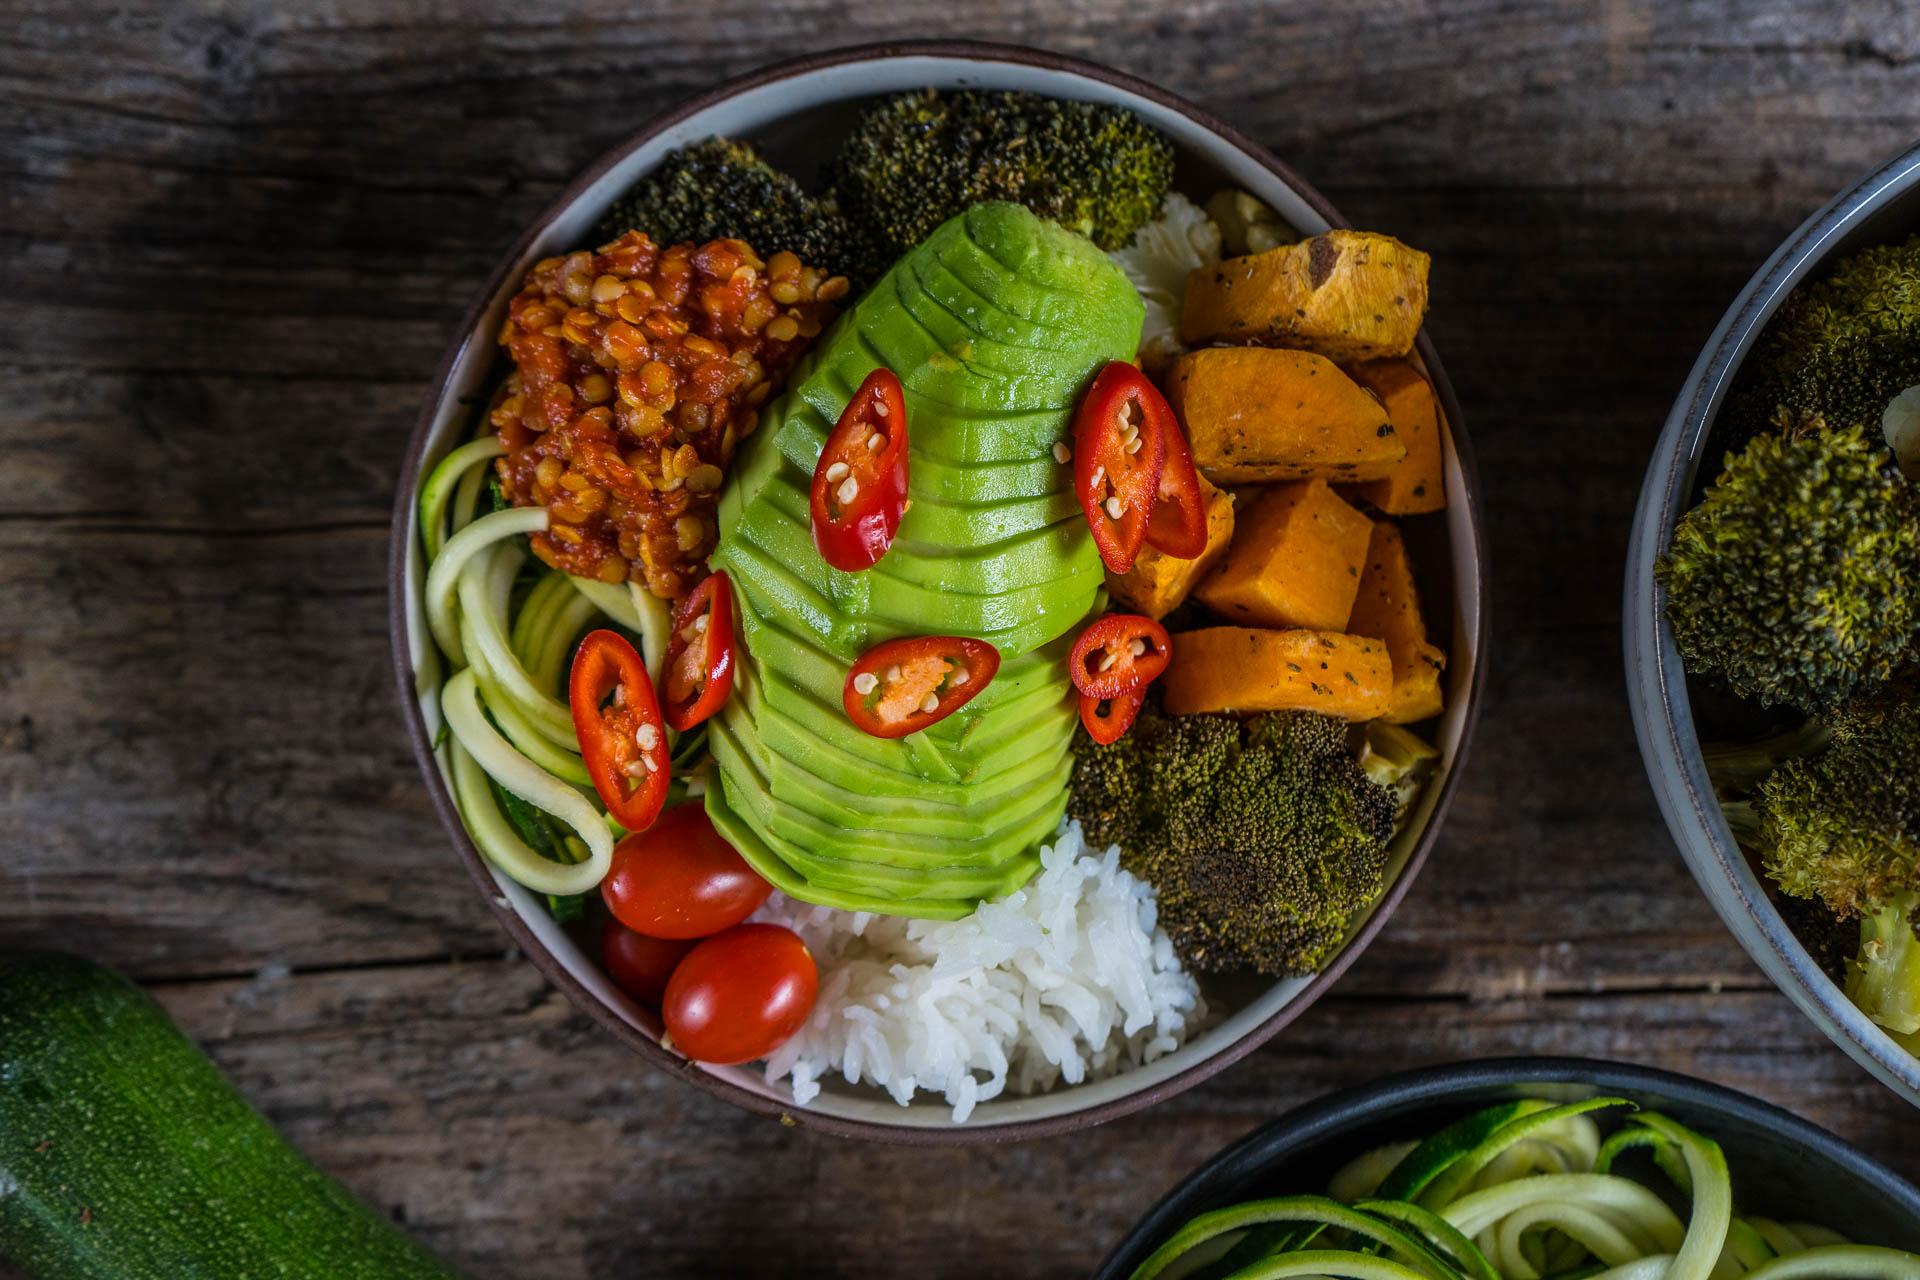 Meal Prep - Rainbow Bowl vegan Mrs Flury